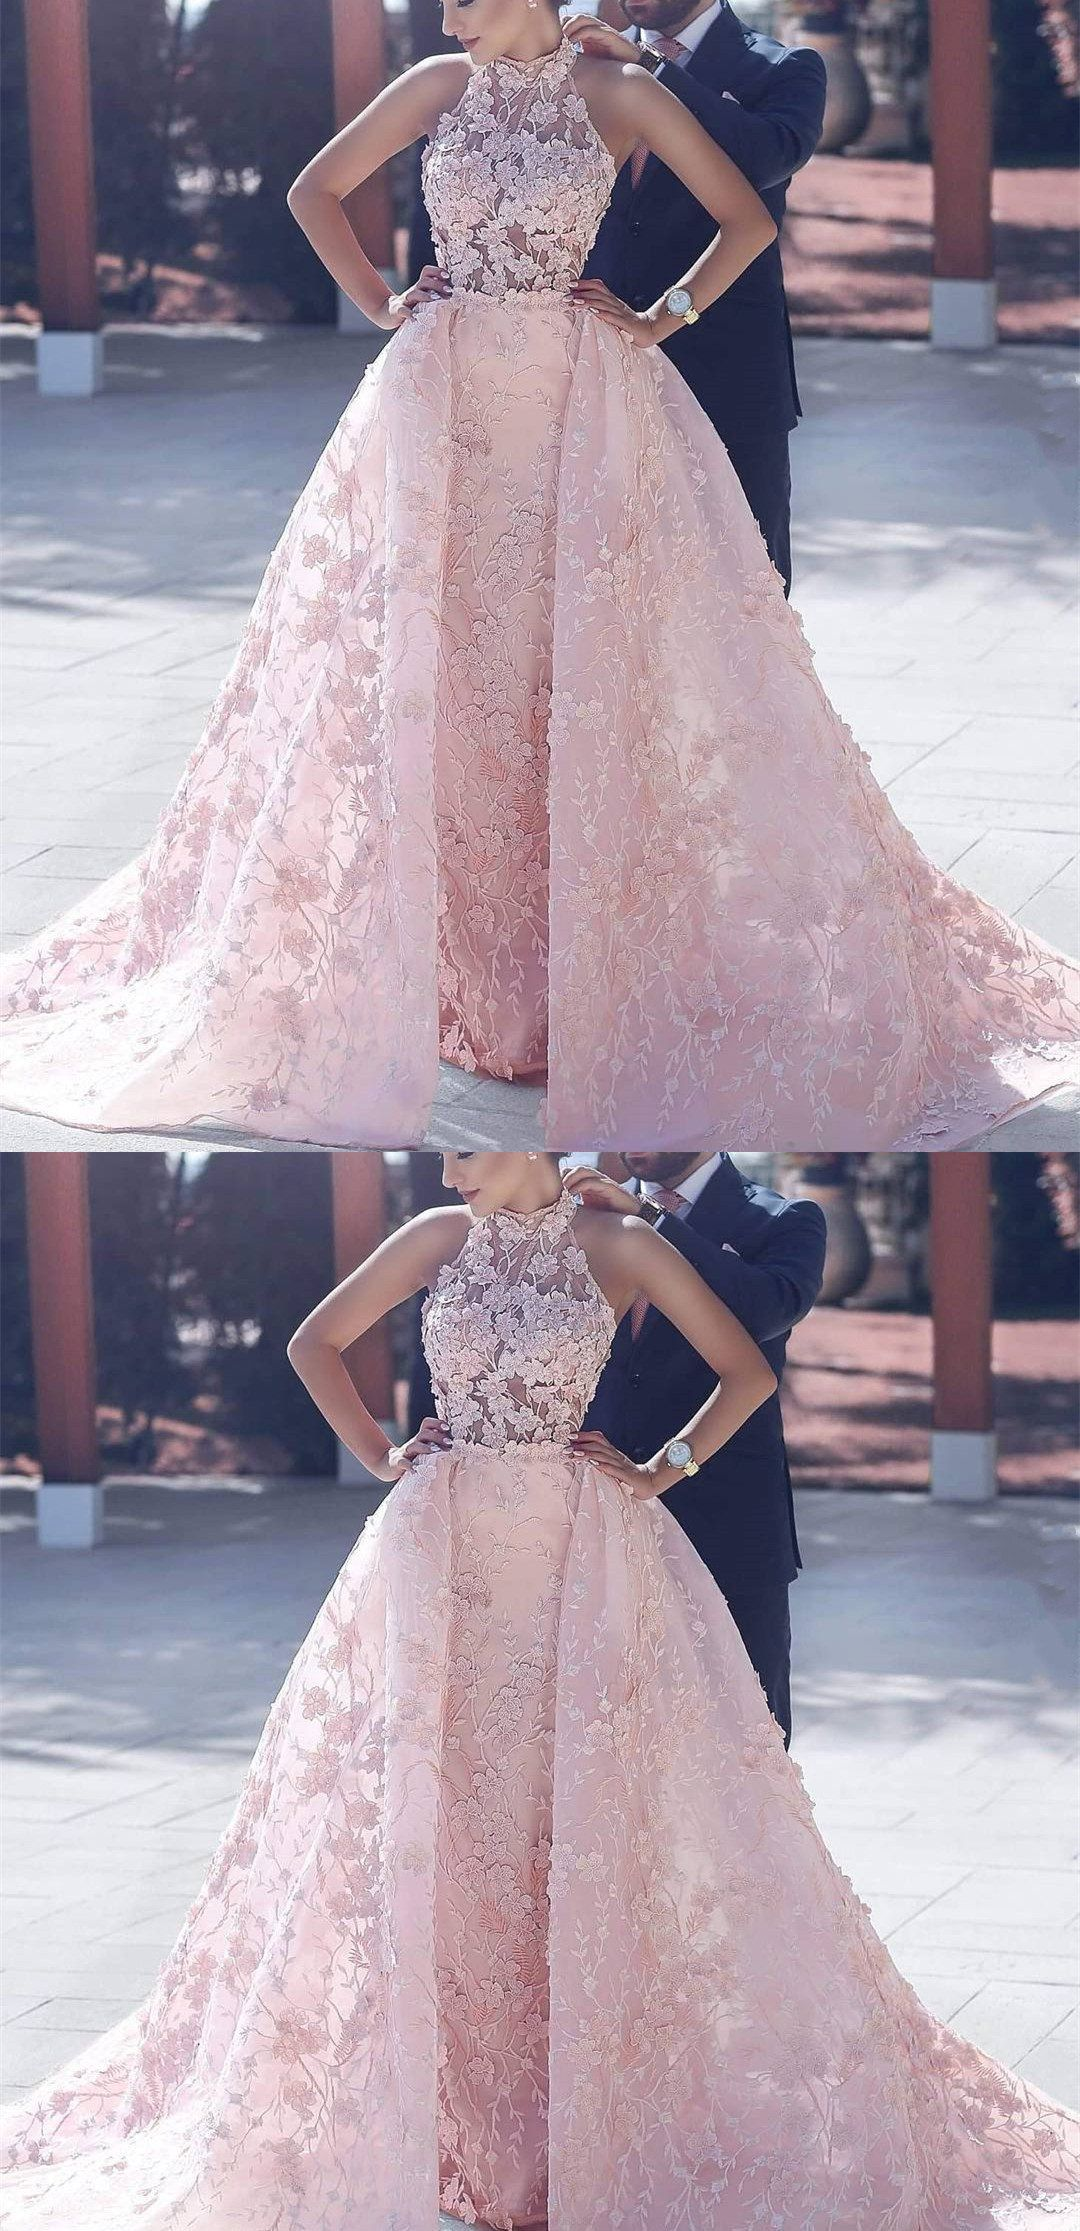 Short prom dresses long sleeve prom dresses long prom dresses